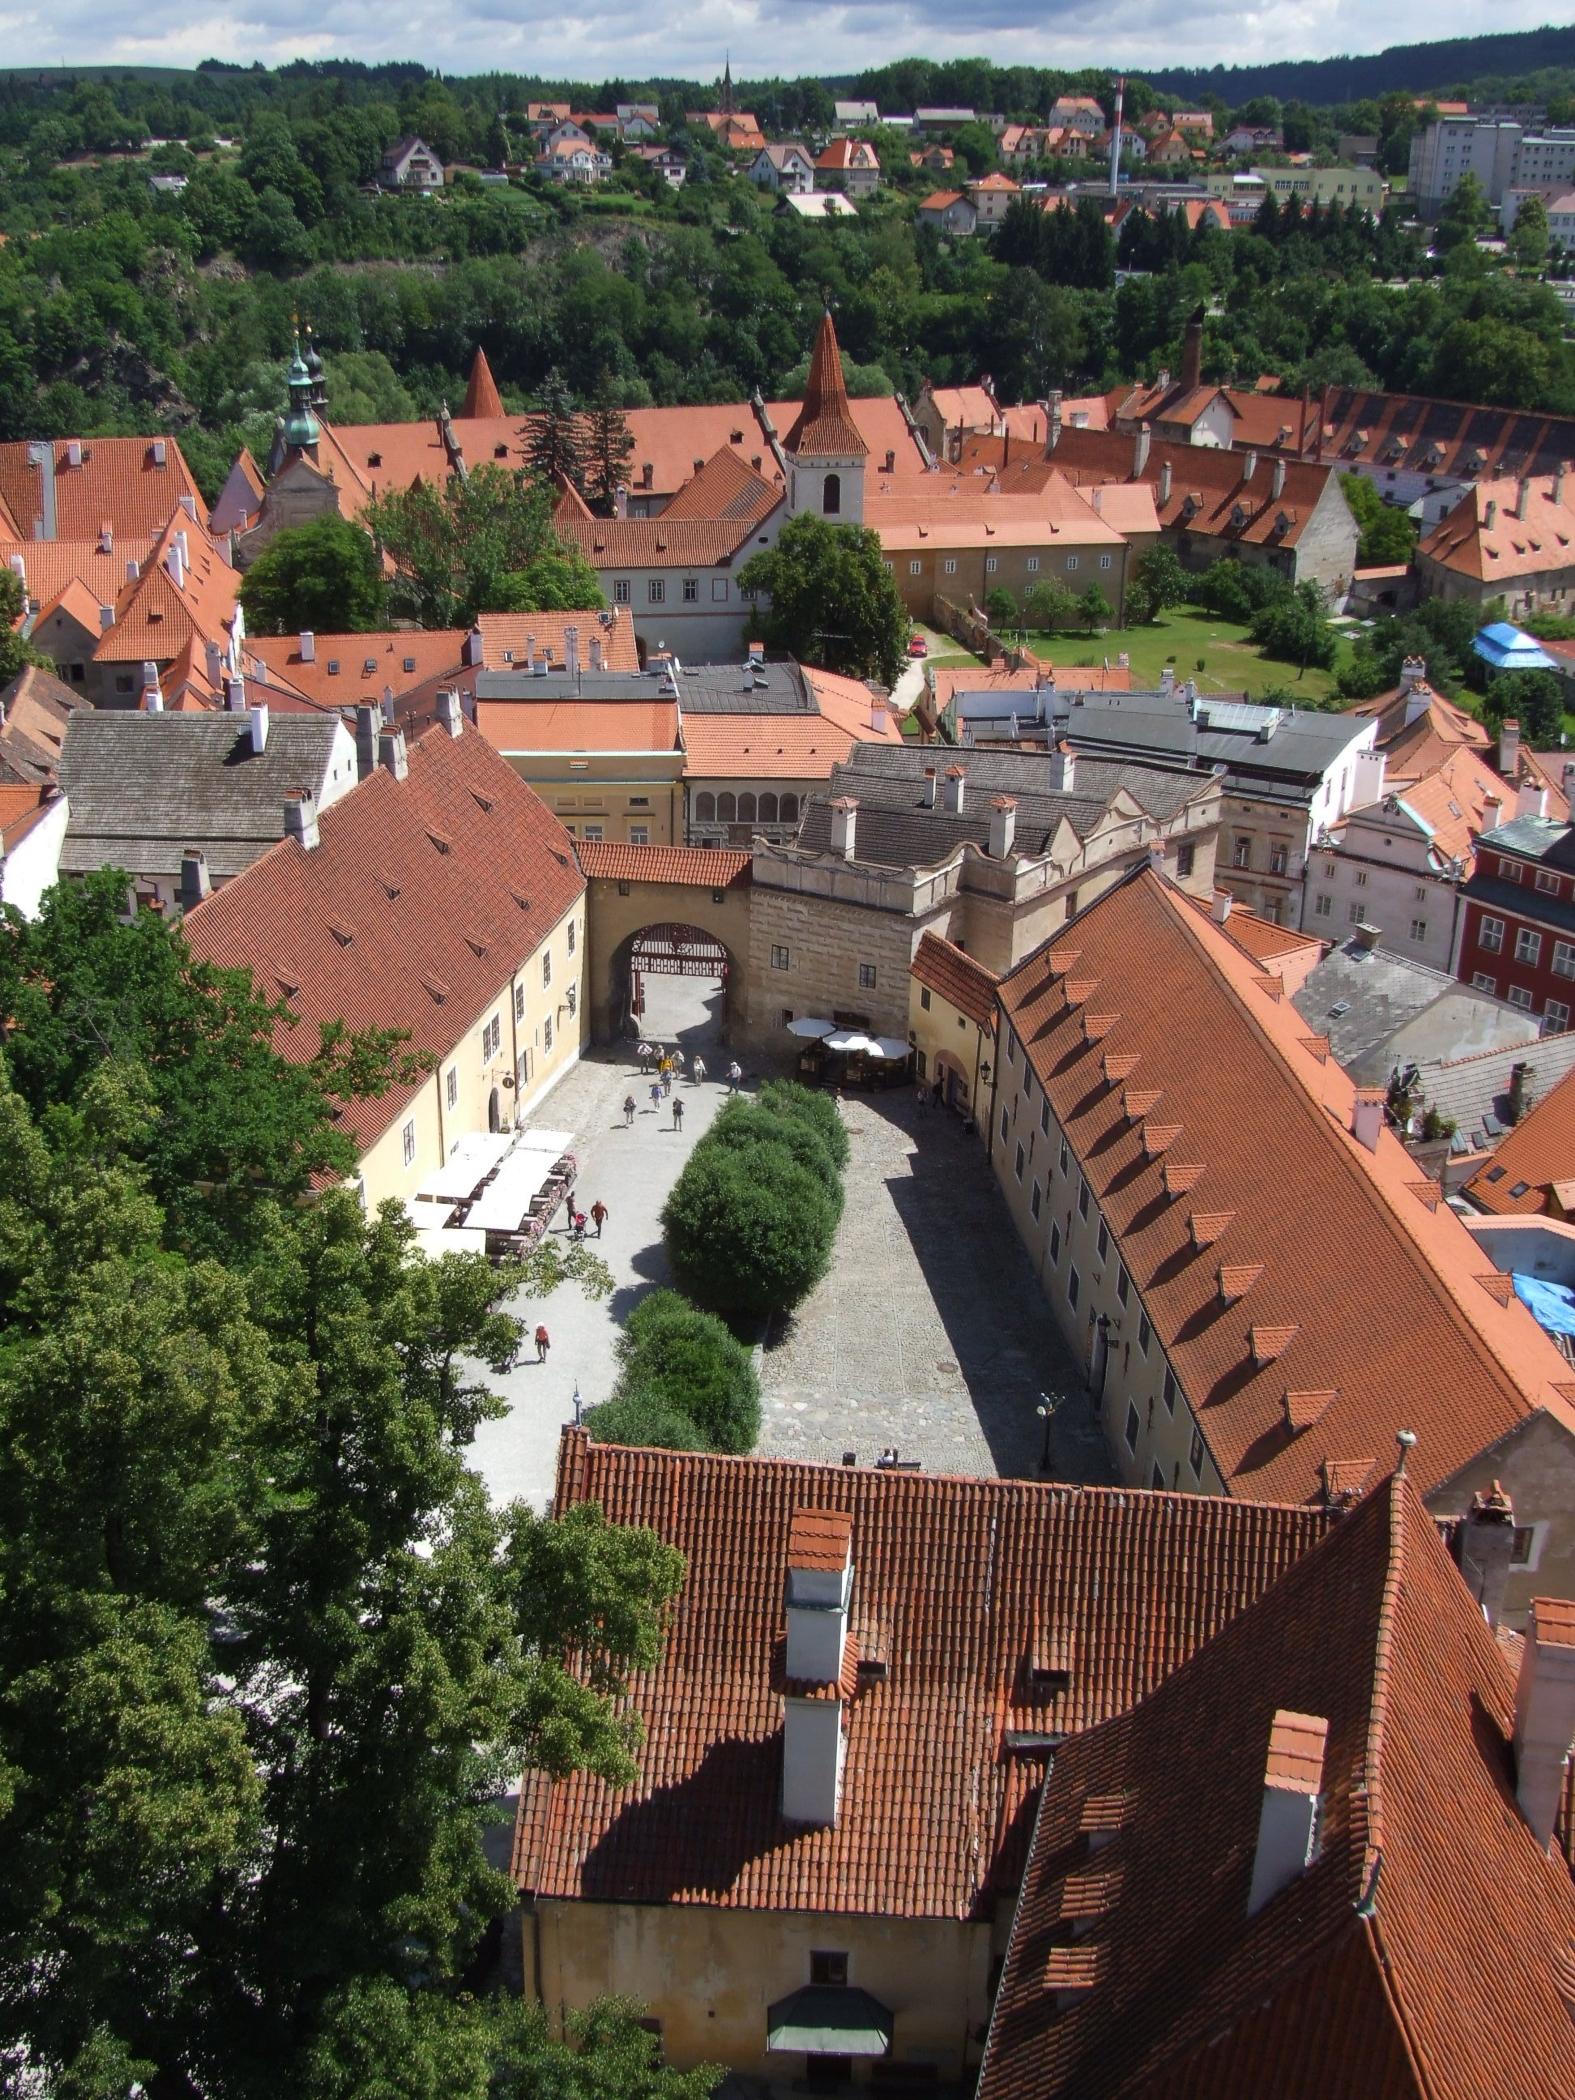 Файл:Český Krumlov (Krummau) - I. nádvoří zámku.jpg